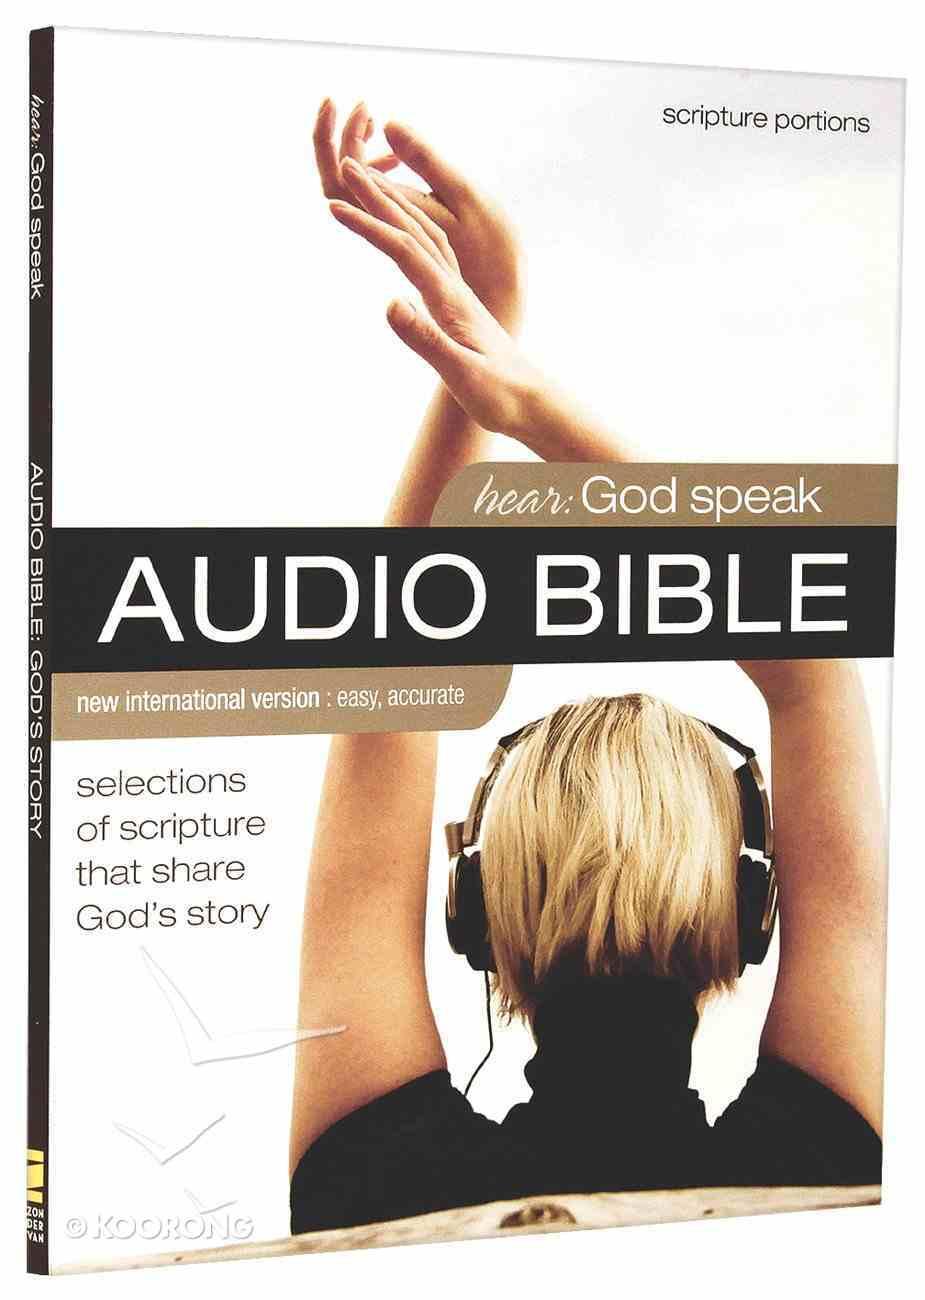 NIV Hear God Speak Audio Bible Selections of Scripture That Share God's Story (2 Cds) CD